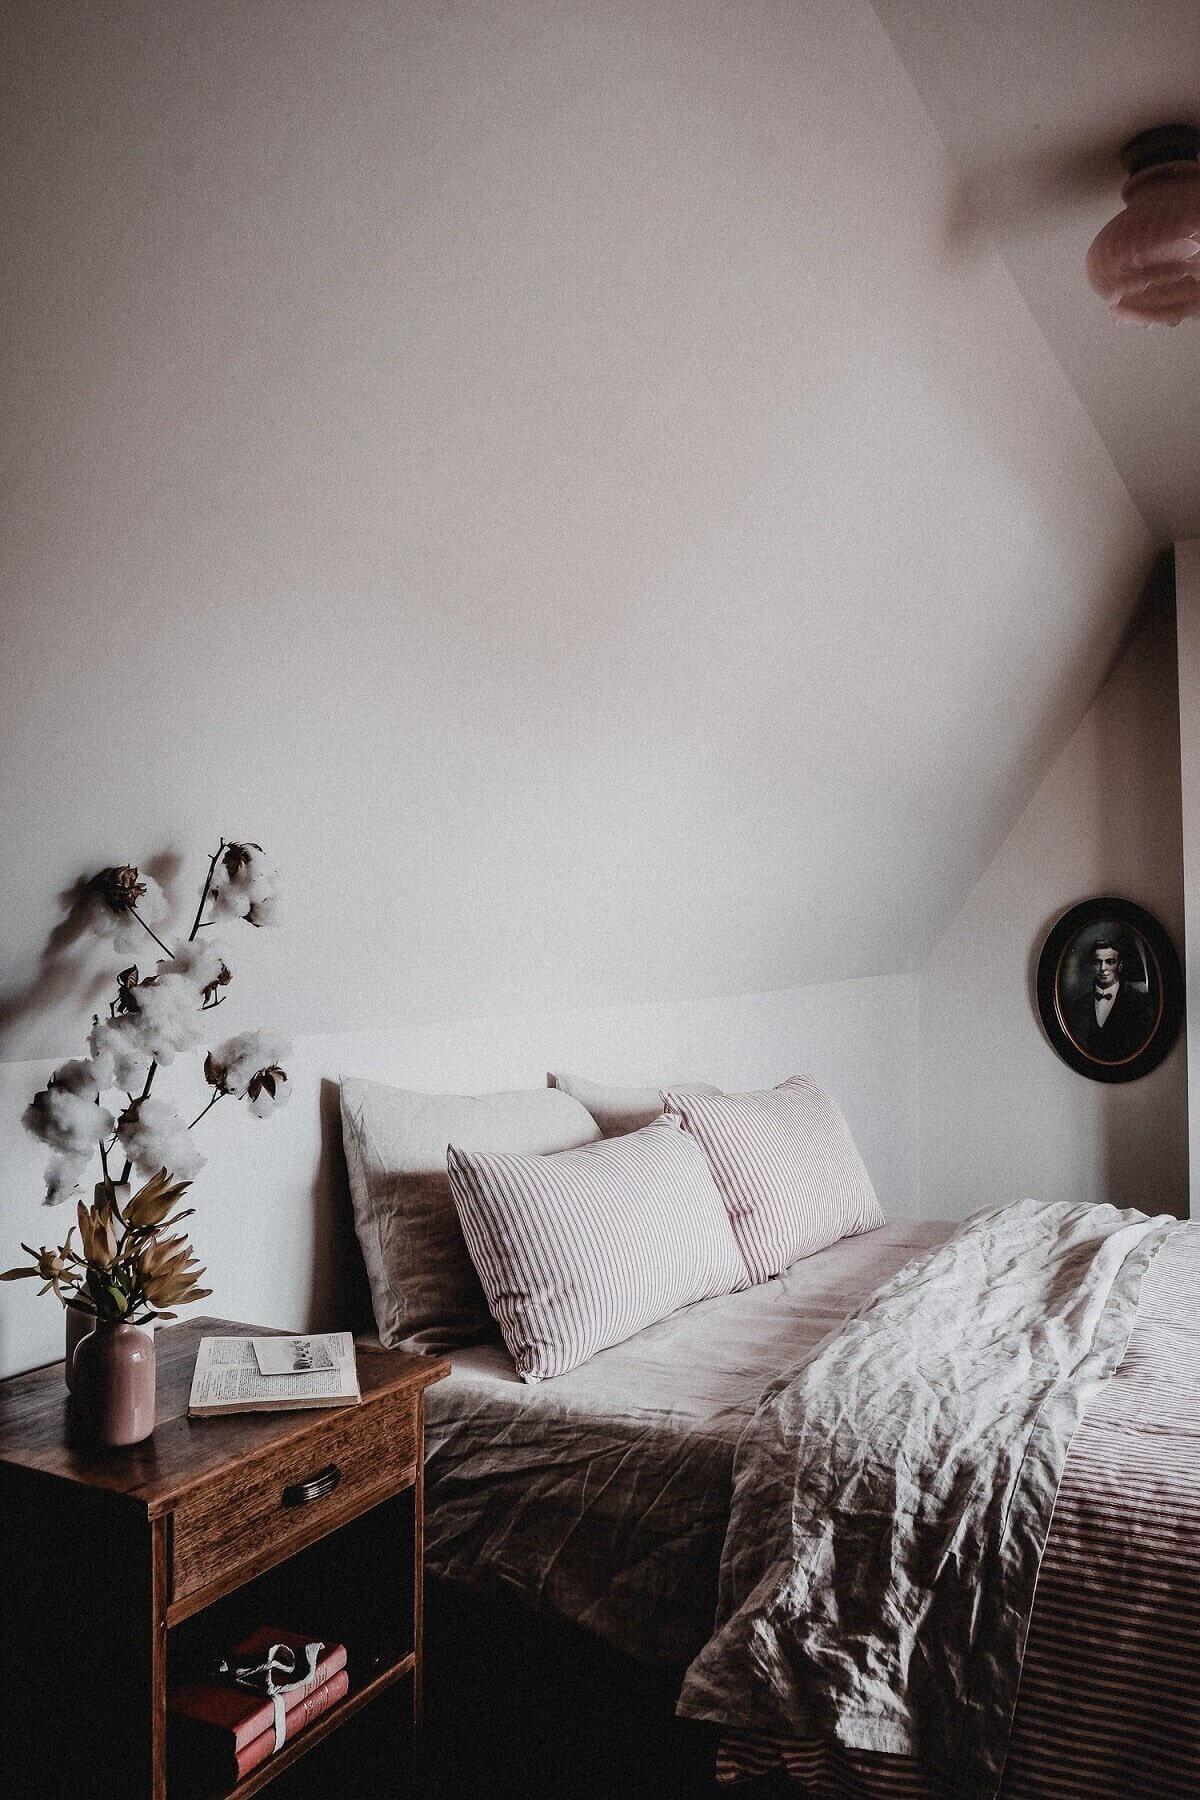 captains-cottage-vintage-airbnb-cottage-hobart-tasmania